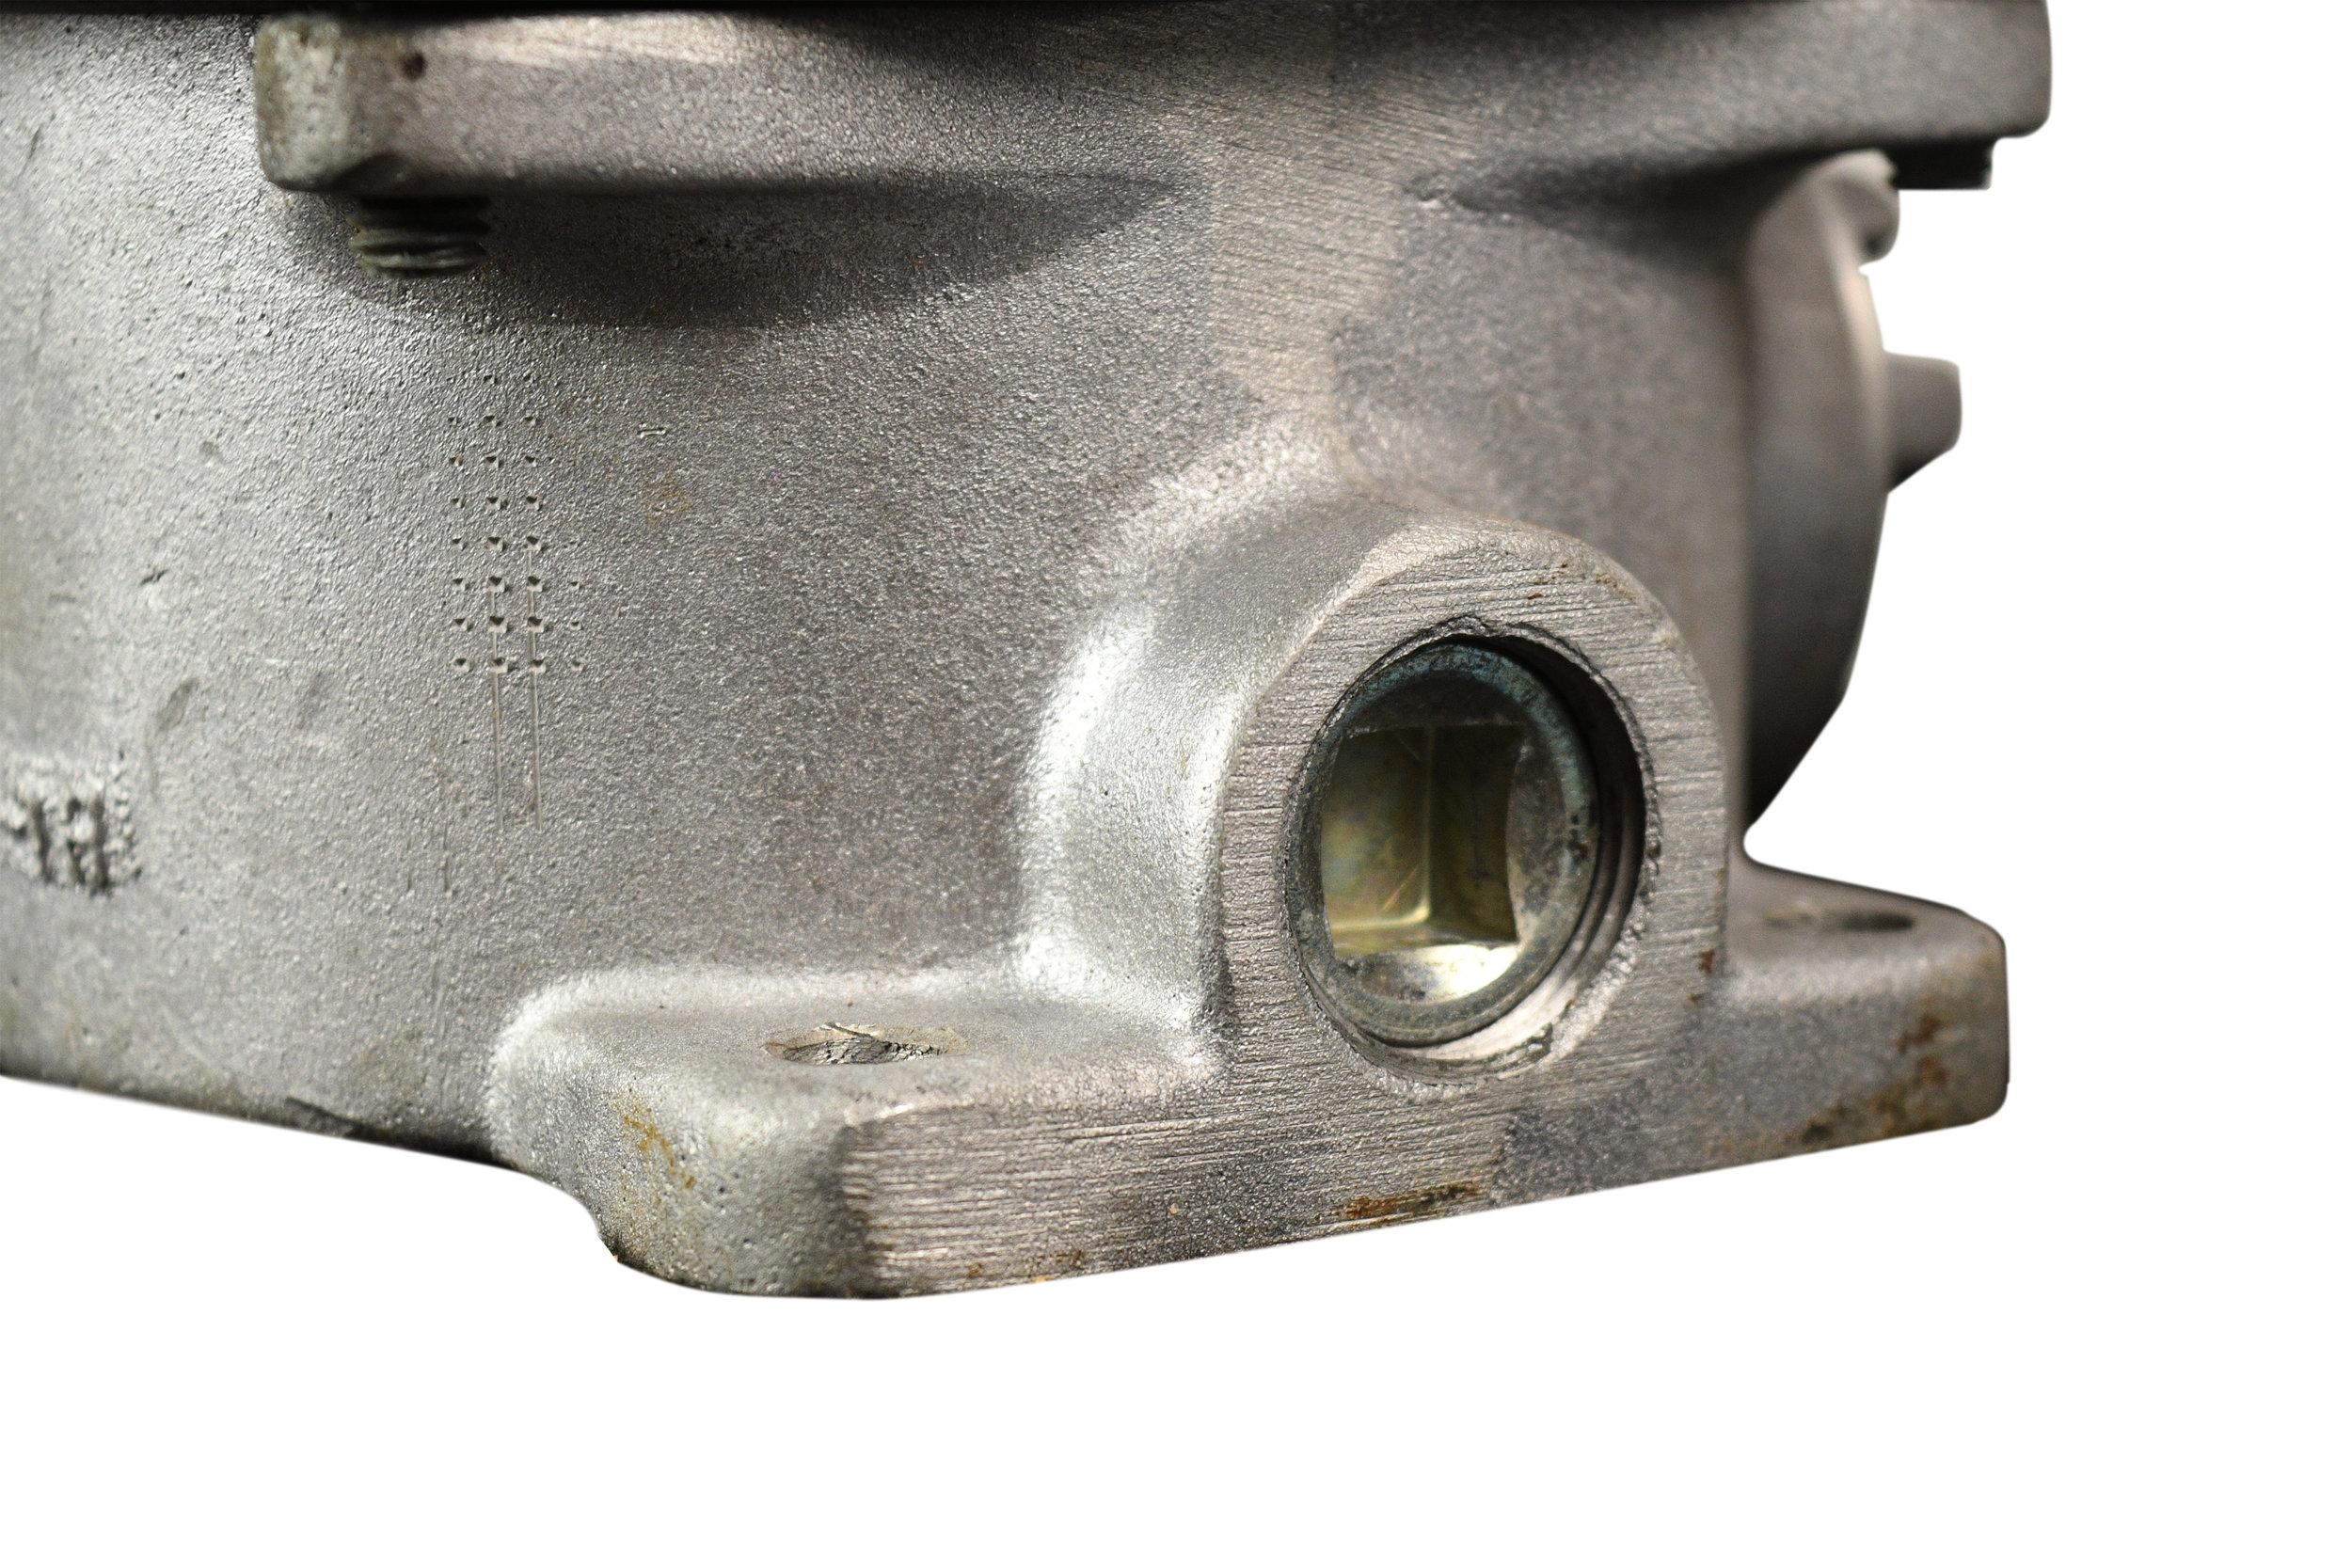 47858-crouse-hinds-spotlight-15.jpg